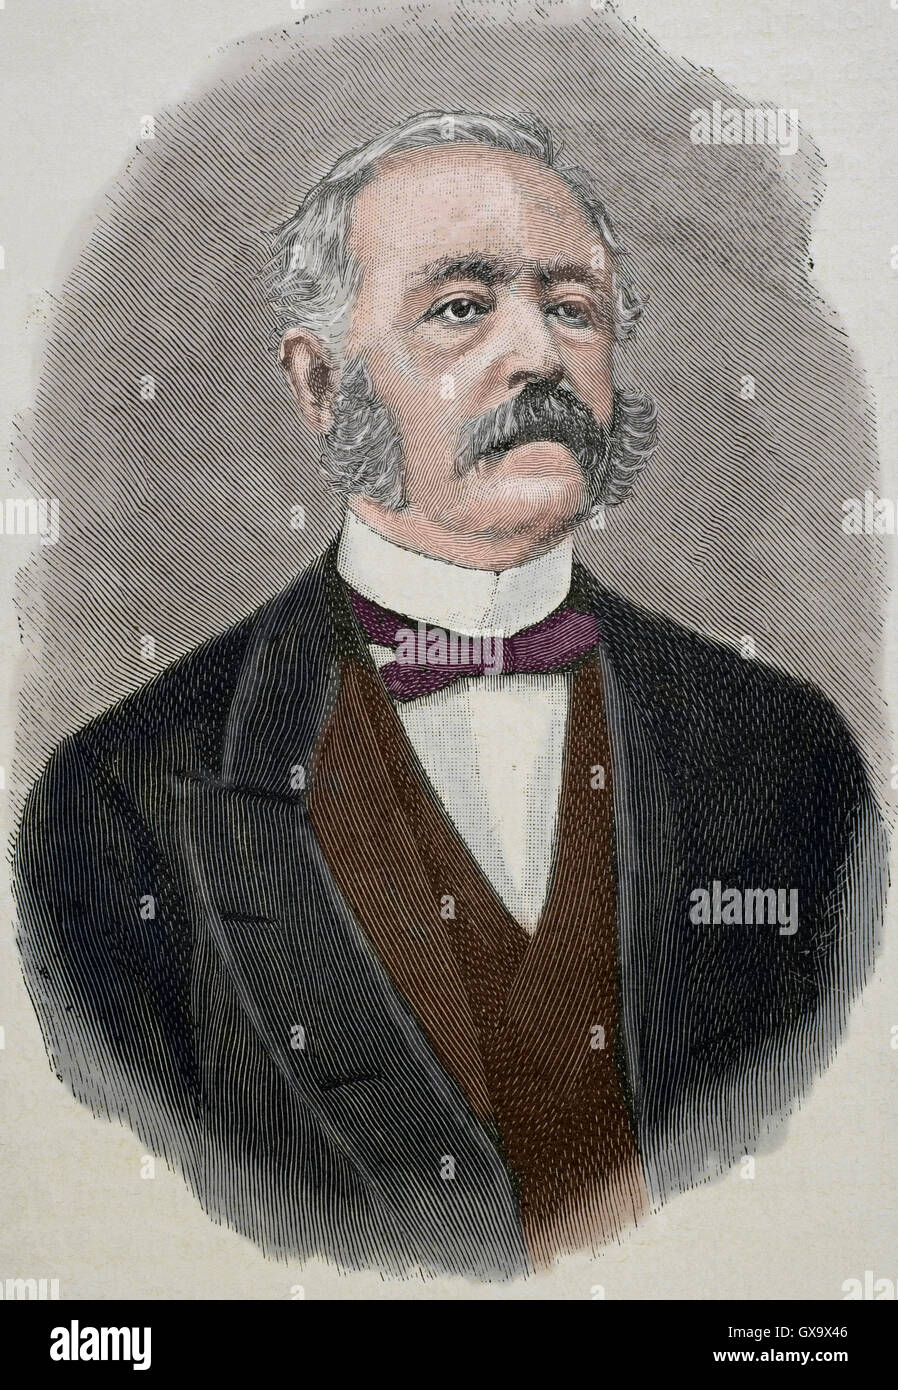 Marco Minghetti (1818-1886). Italian economist and statesman. Portrait. Engraving by Historia Universal, 1885. Colored. - Stock Image